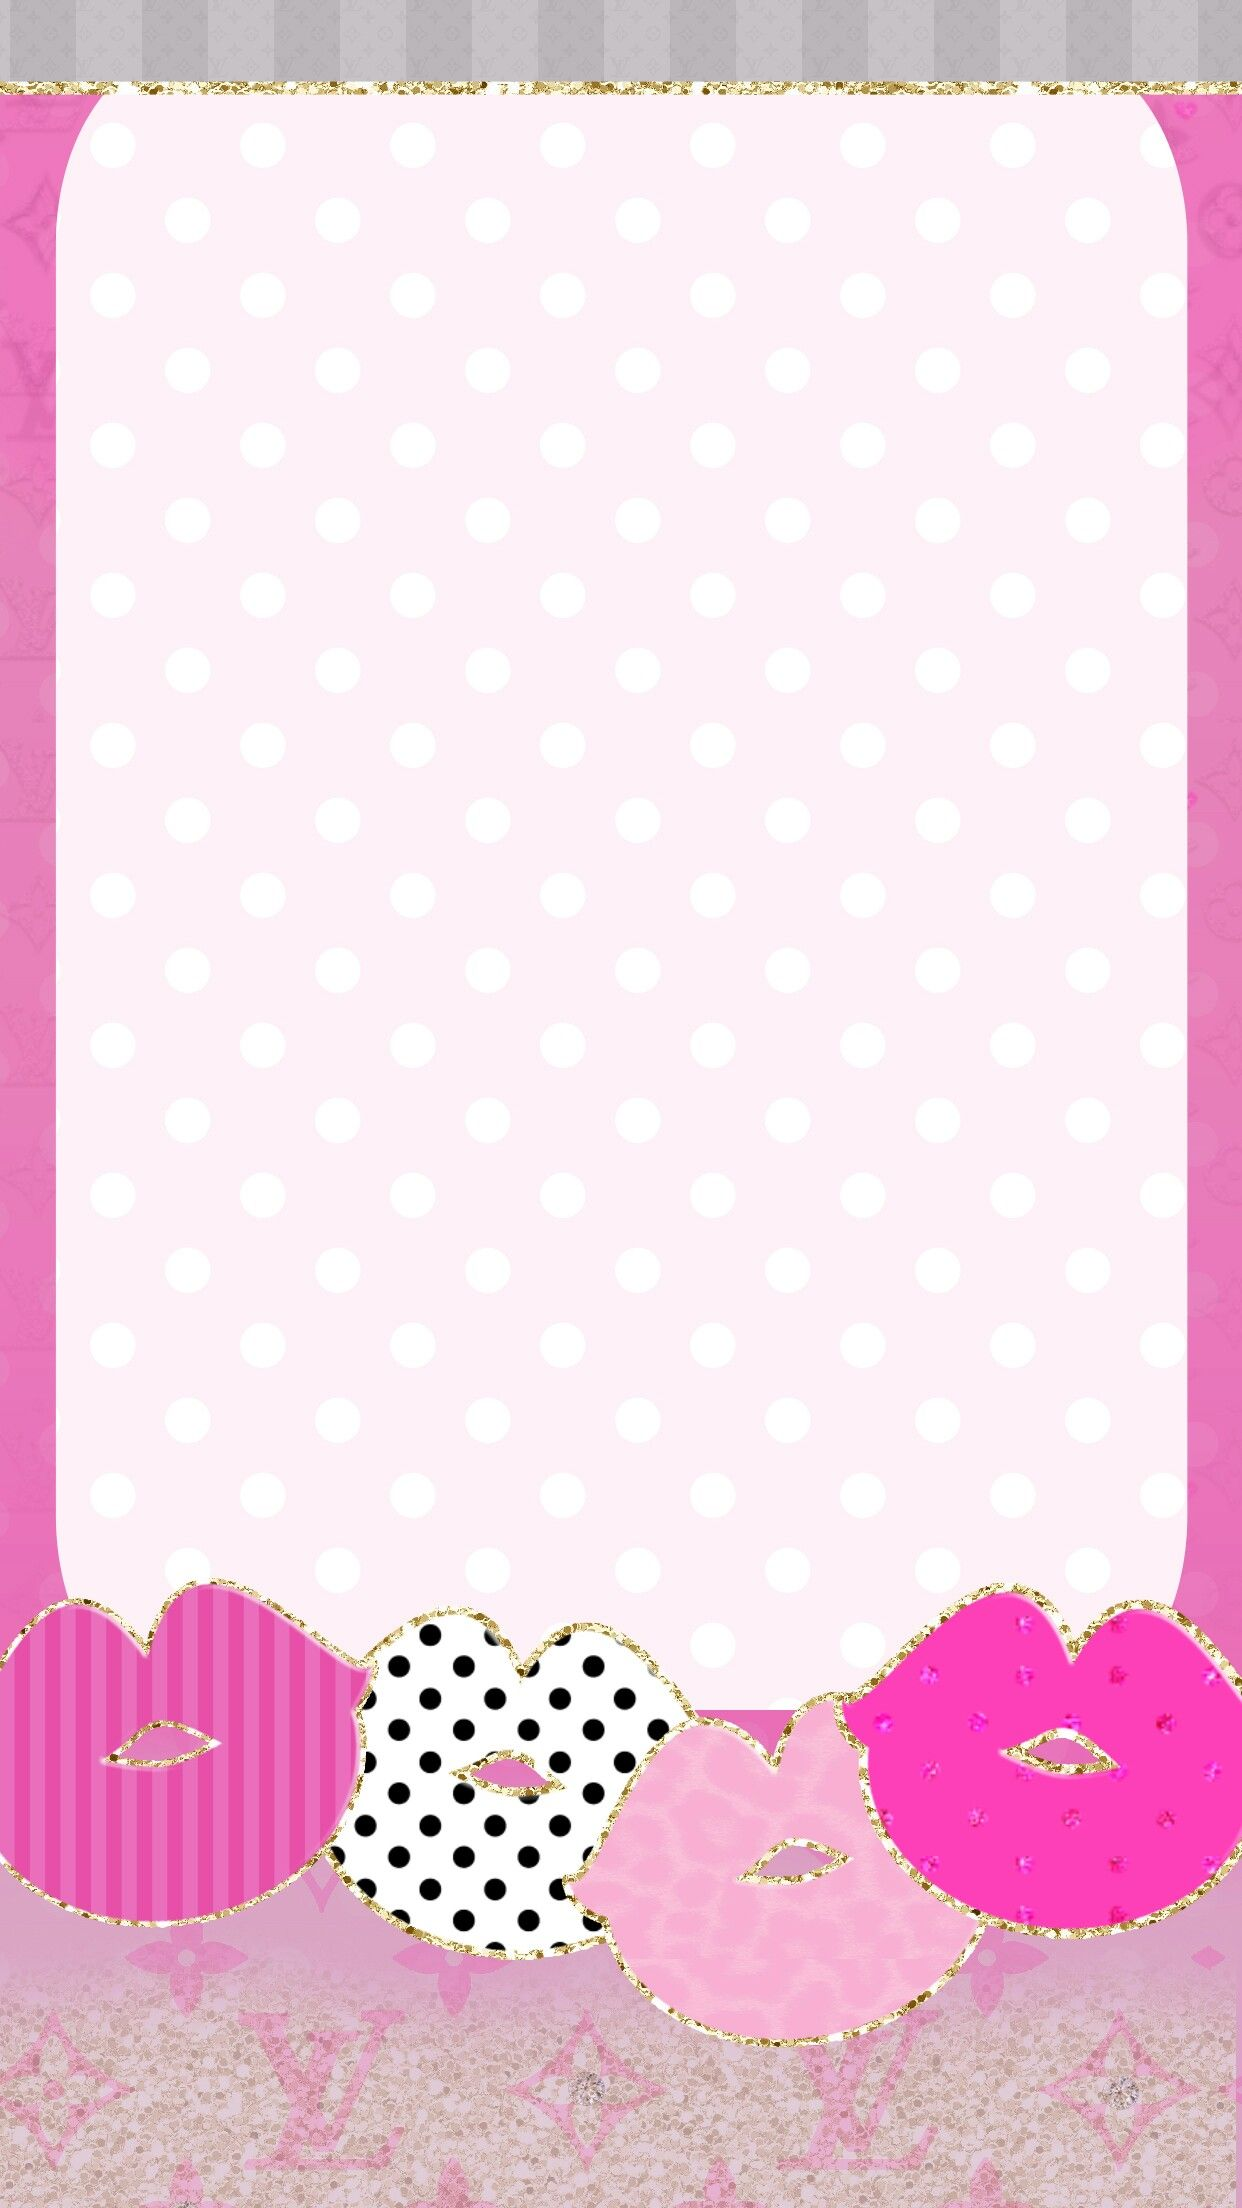 Simple Wallpaper Home Screen Hello Kitty - dc93131b8bc23594e4716b0b81c1547f  HD_59516.jpg